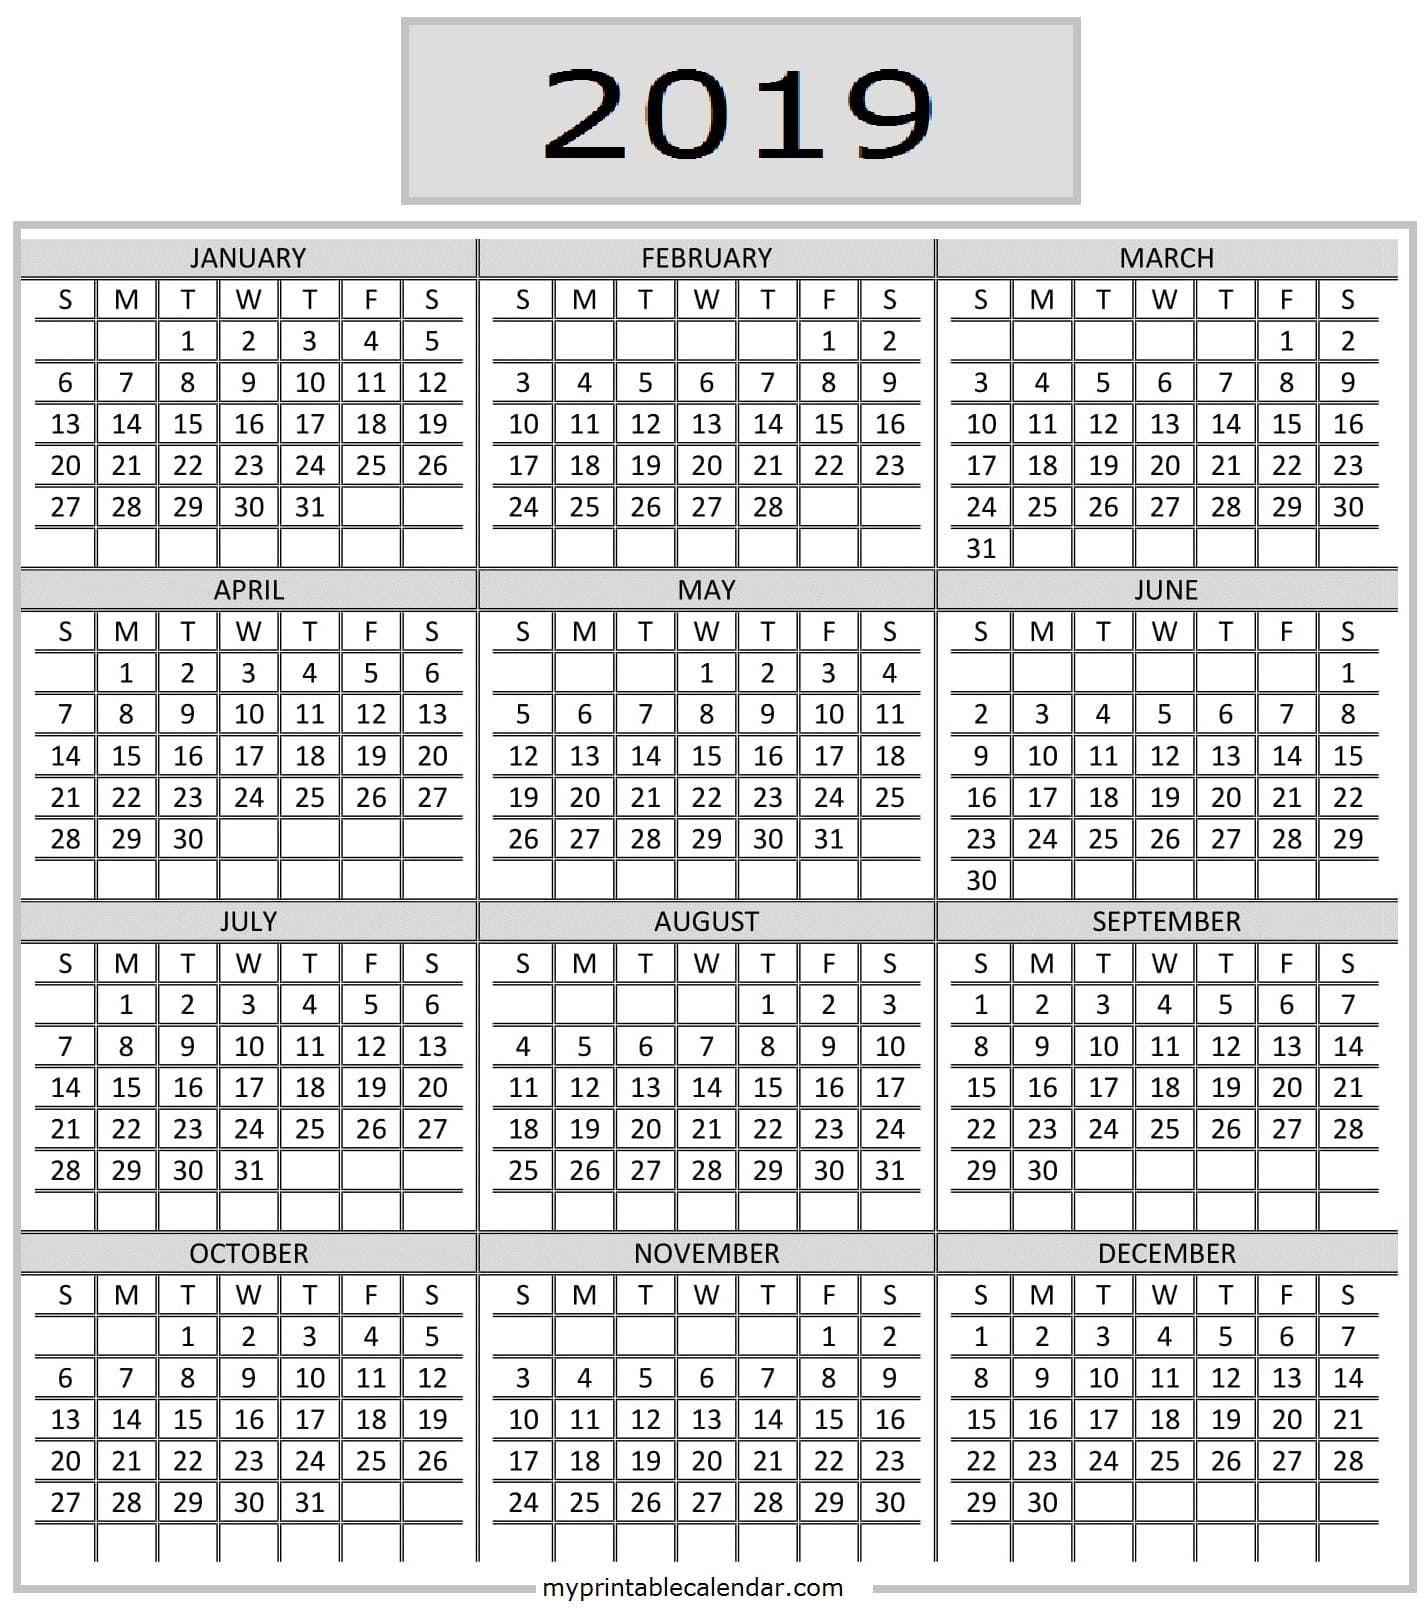 Pocket Calendar 2019 Printable | Calendar 2019 Printable